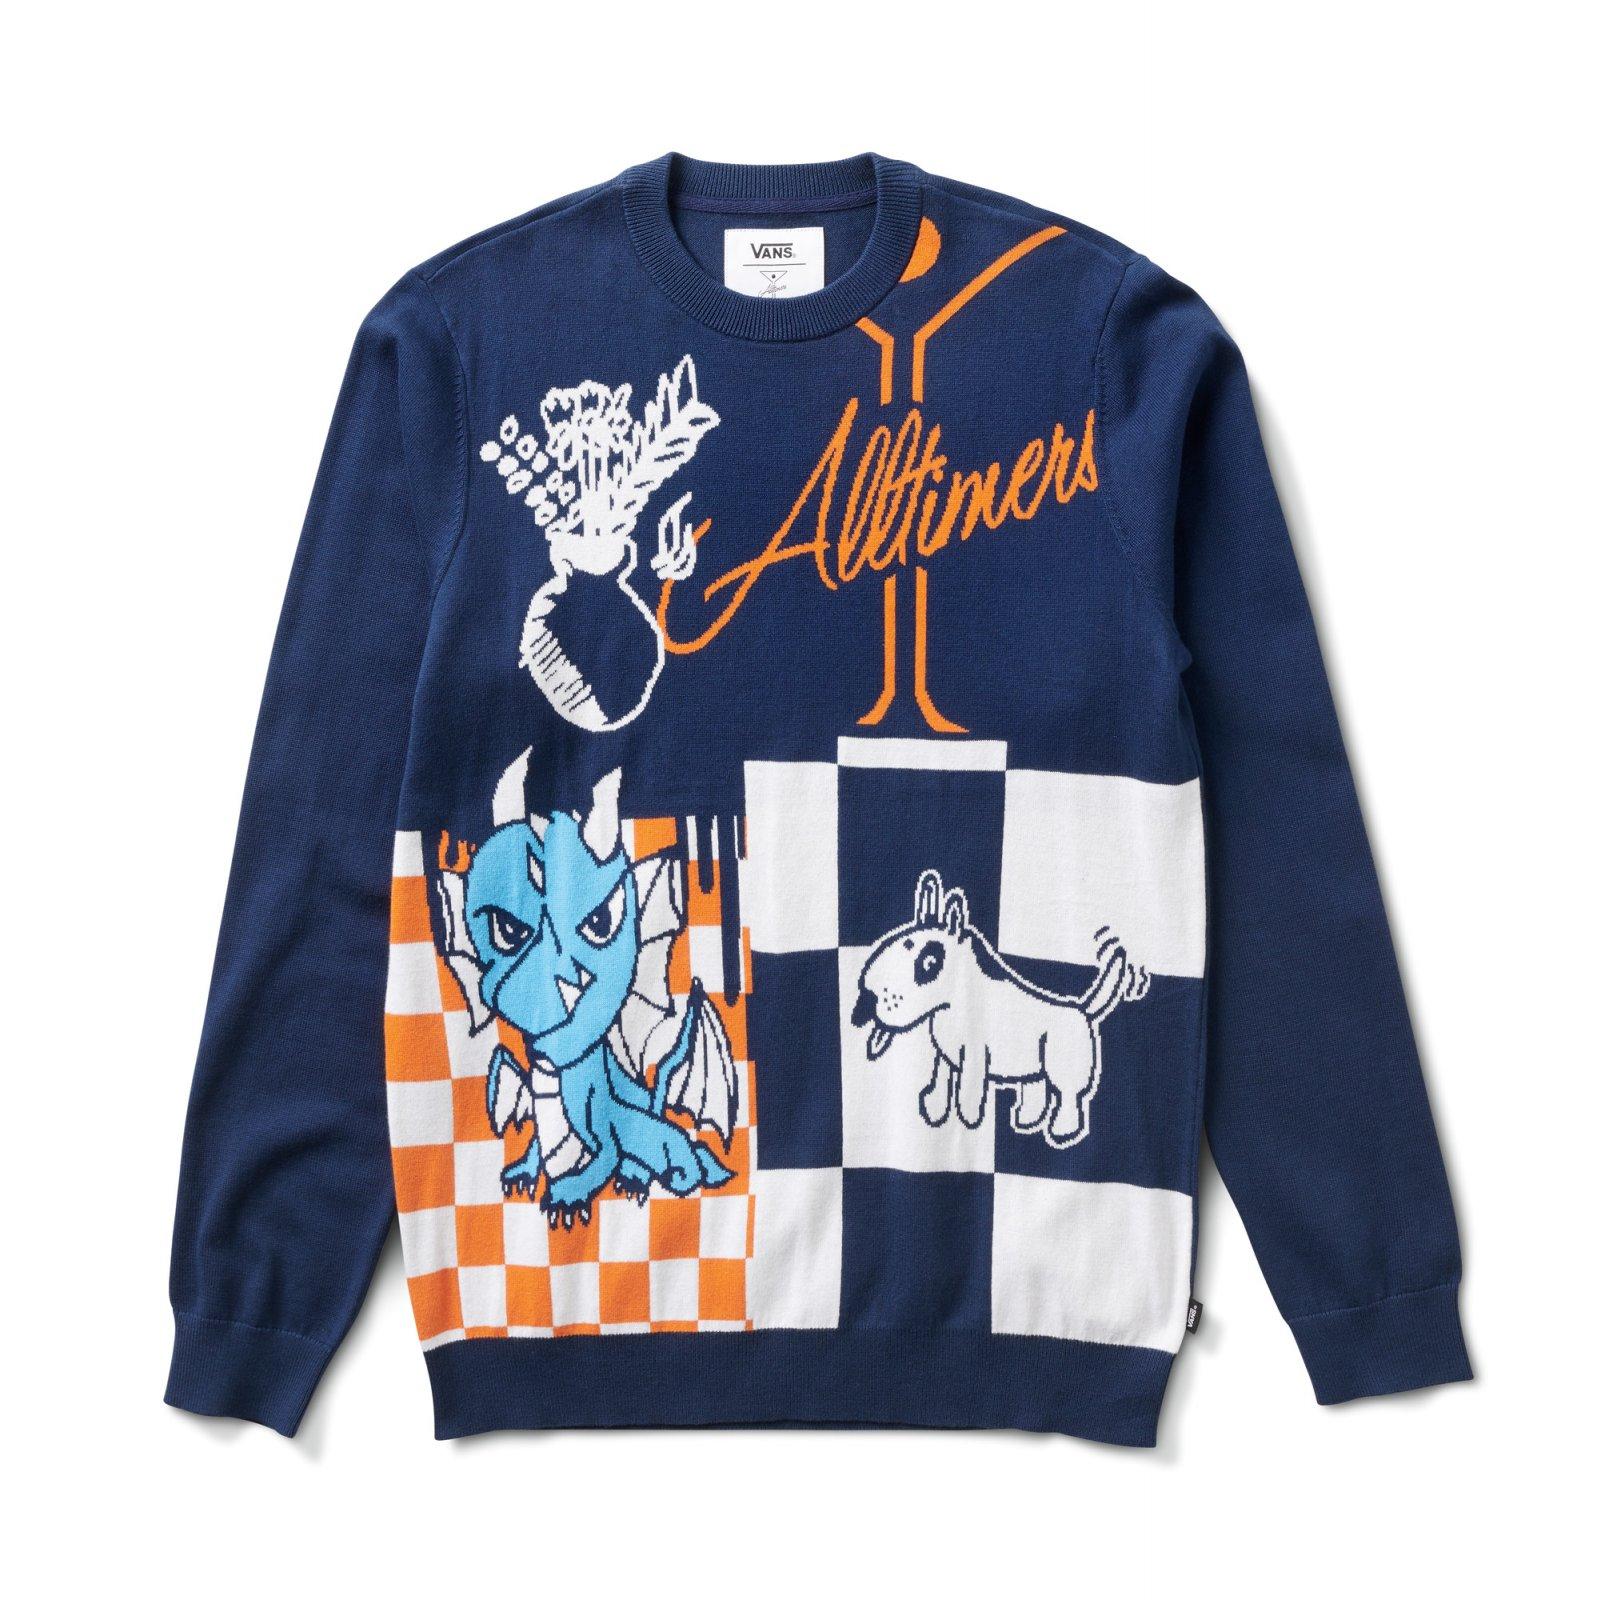 Vans X Alltimers Sweater dress blues